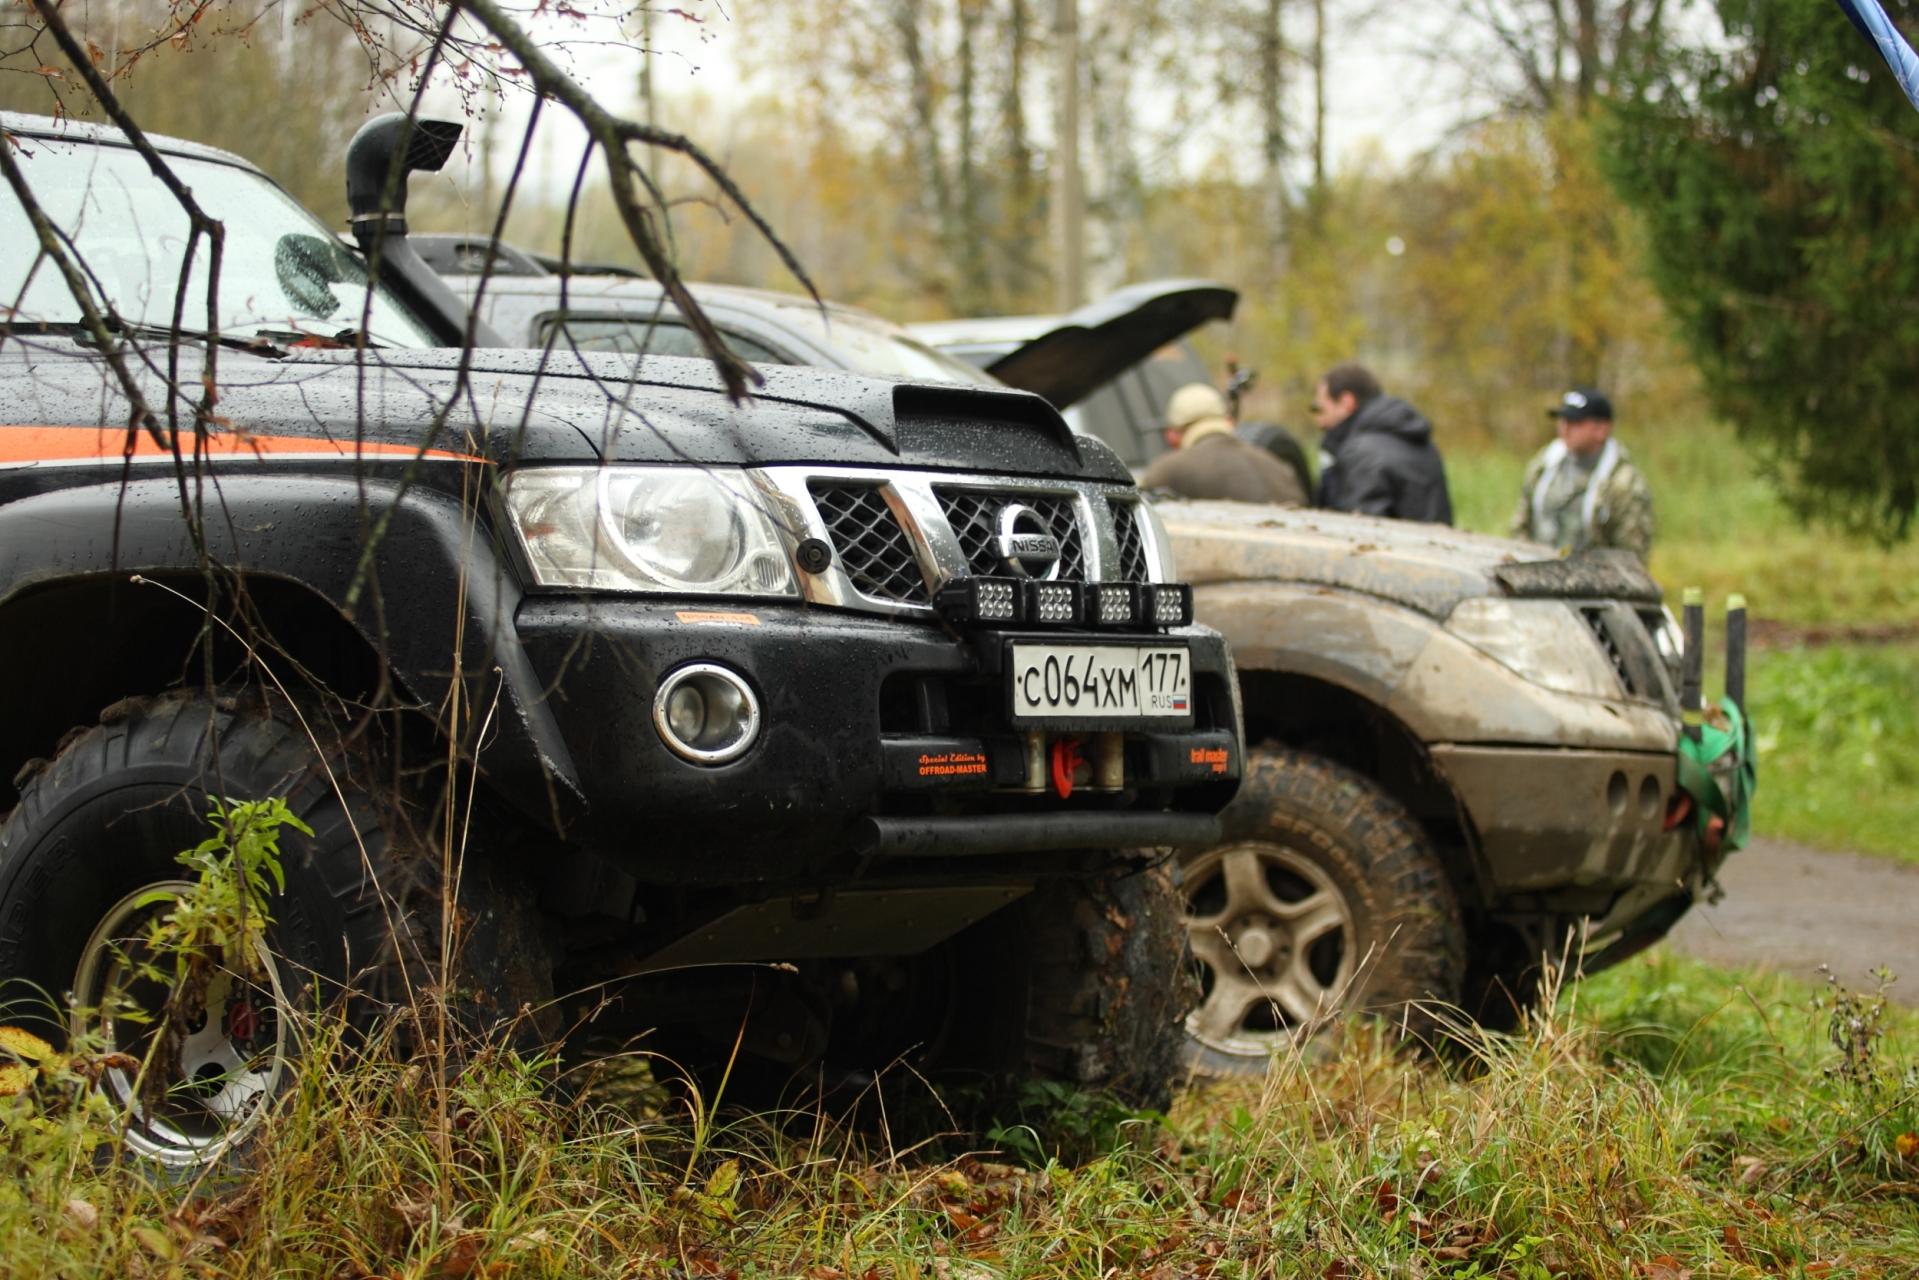 ISEA autoclubman 008